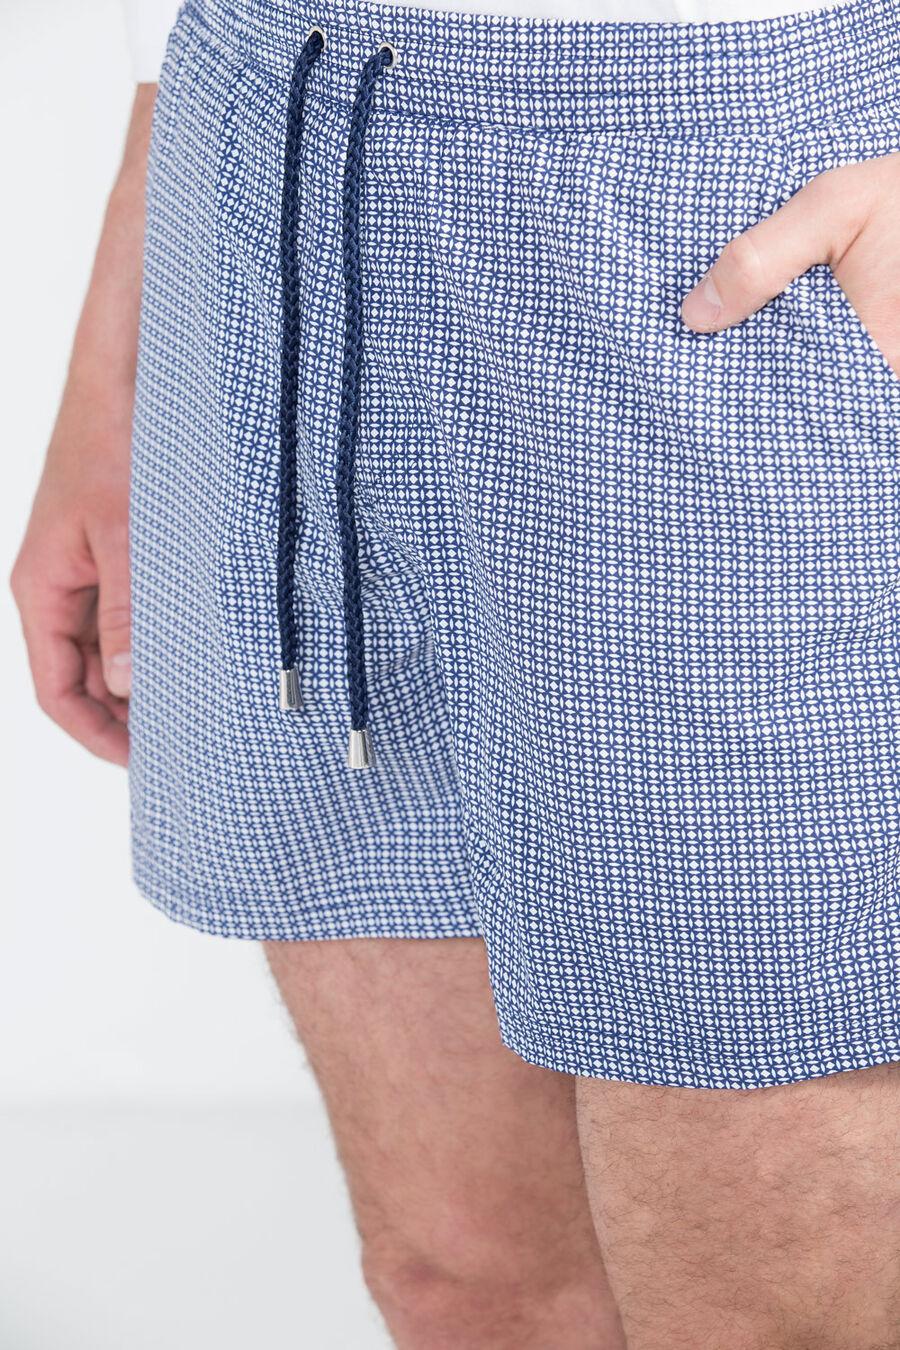 Patterned swim shorts